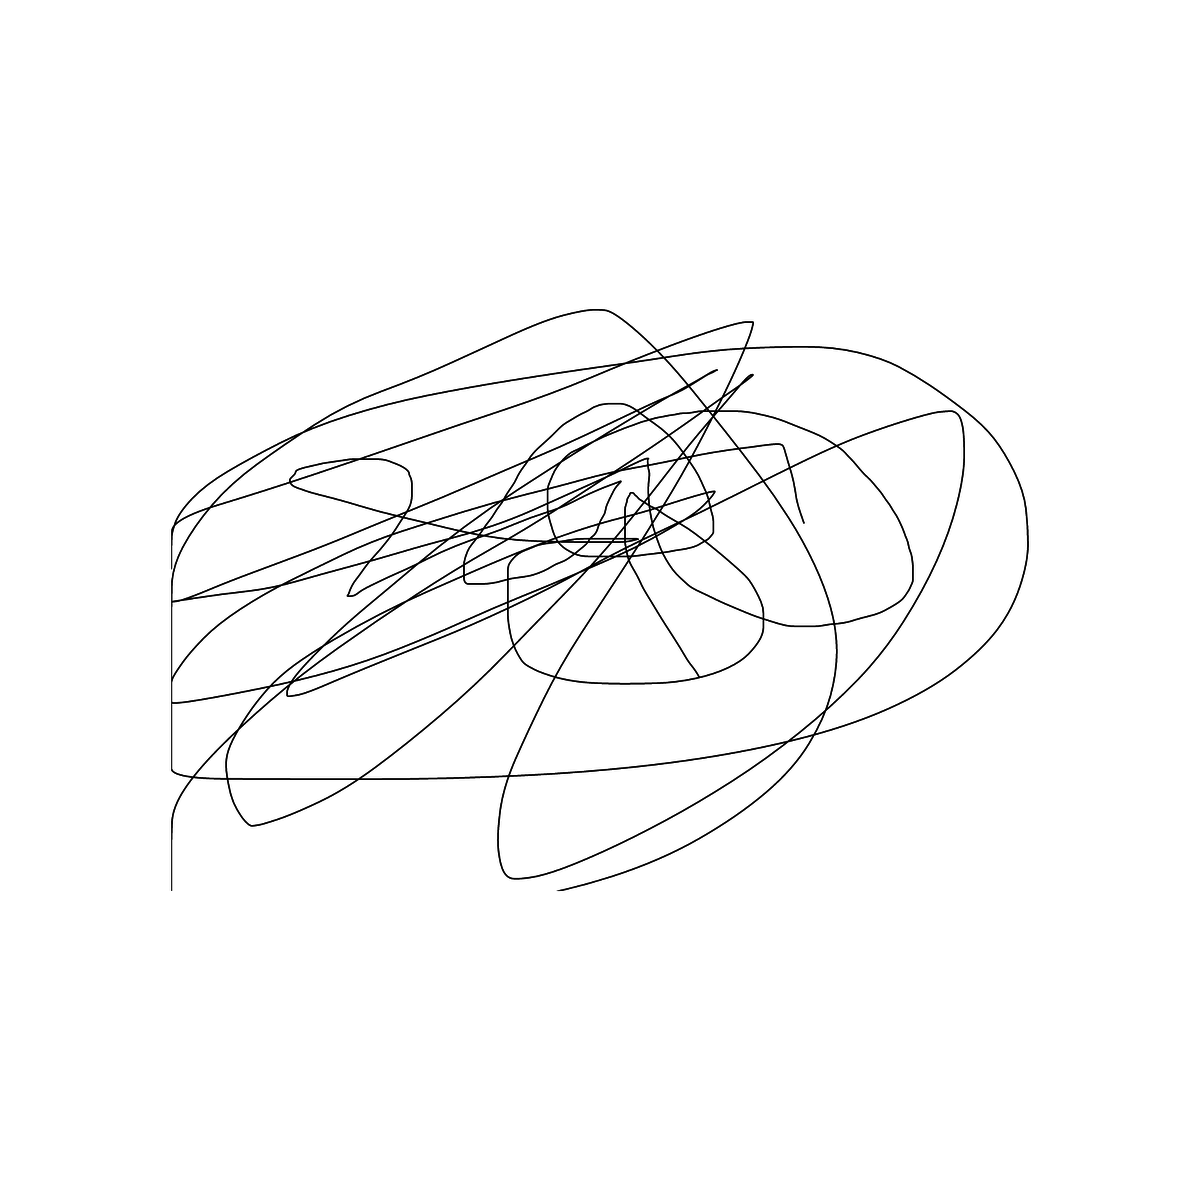 BAAAM drawing#10391 lat:43.6473083496093750lng: -79.3925094604492200